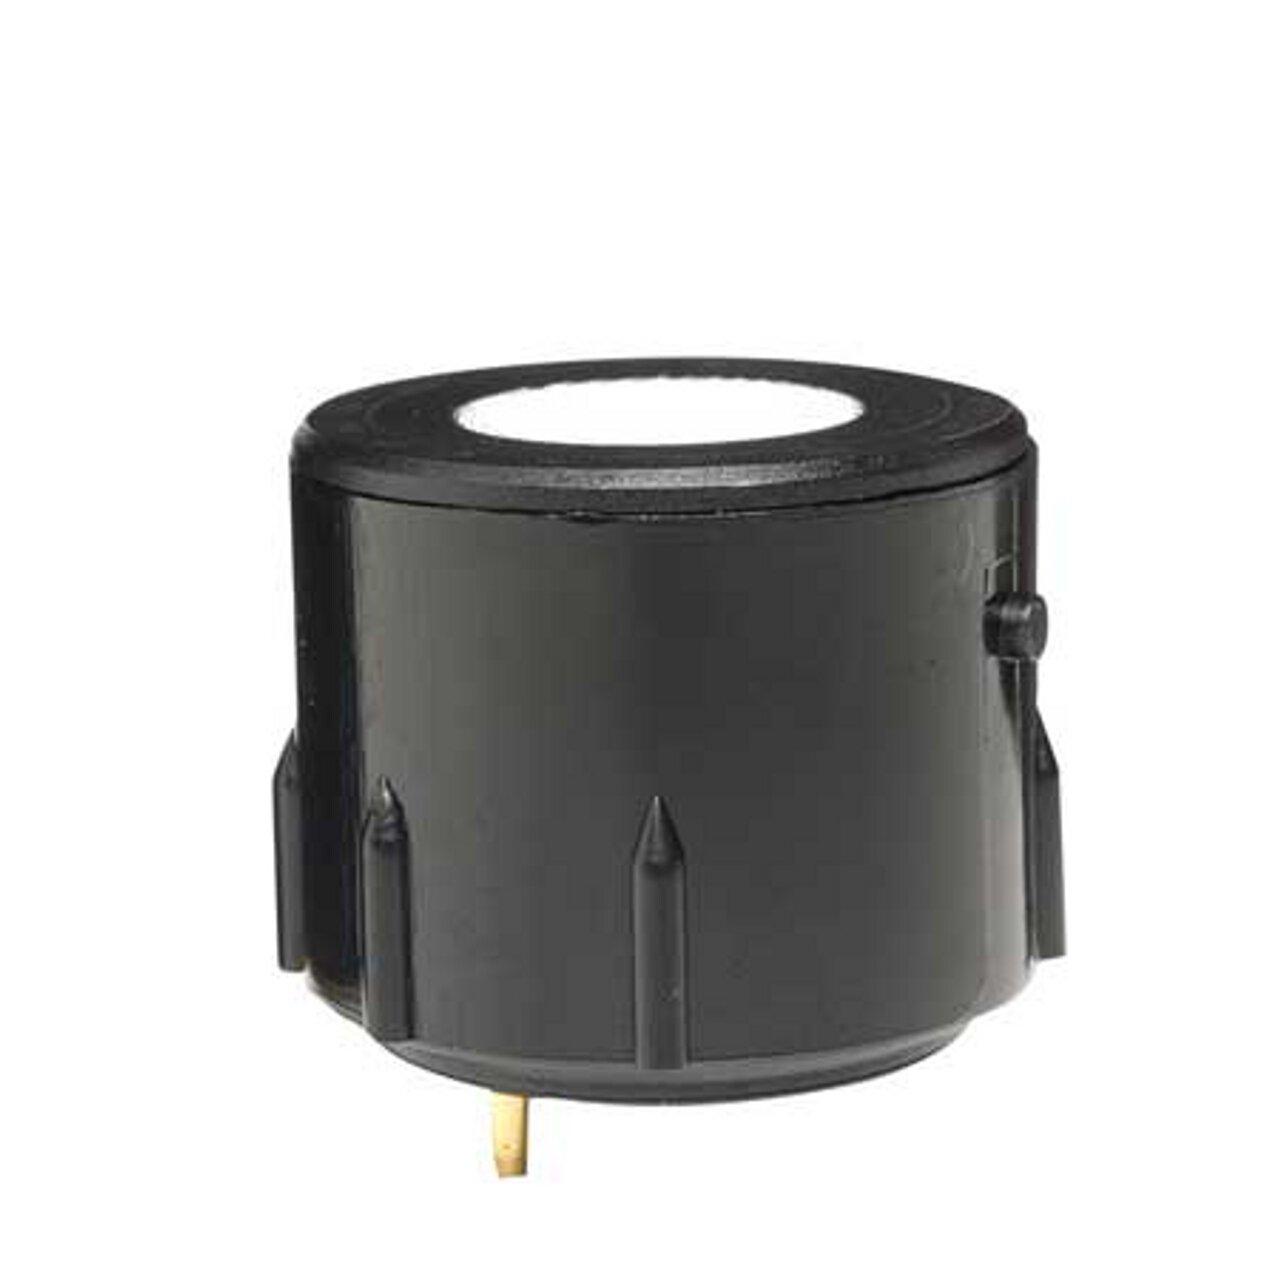 Bacharach 24-0788 Replacement Oxygen Sensor by Bacharach